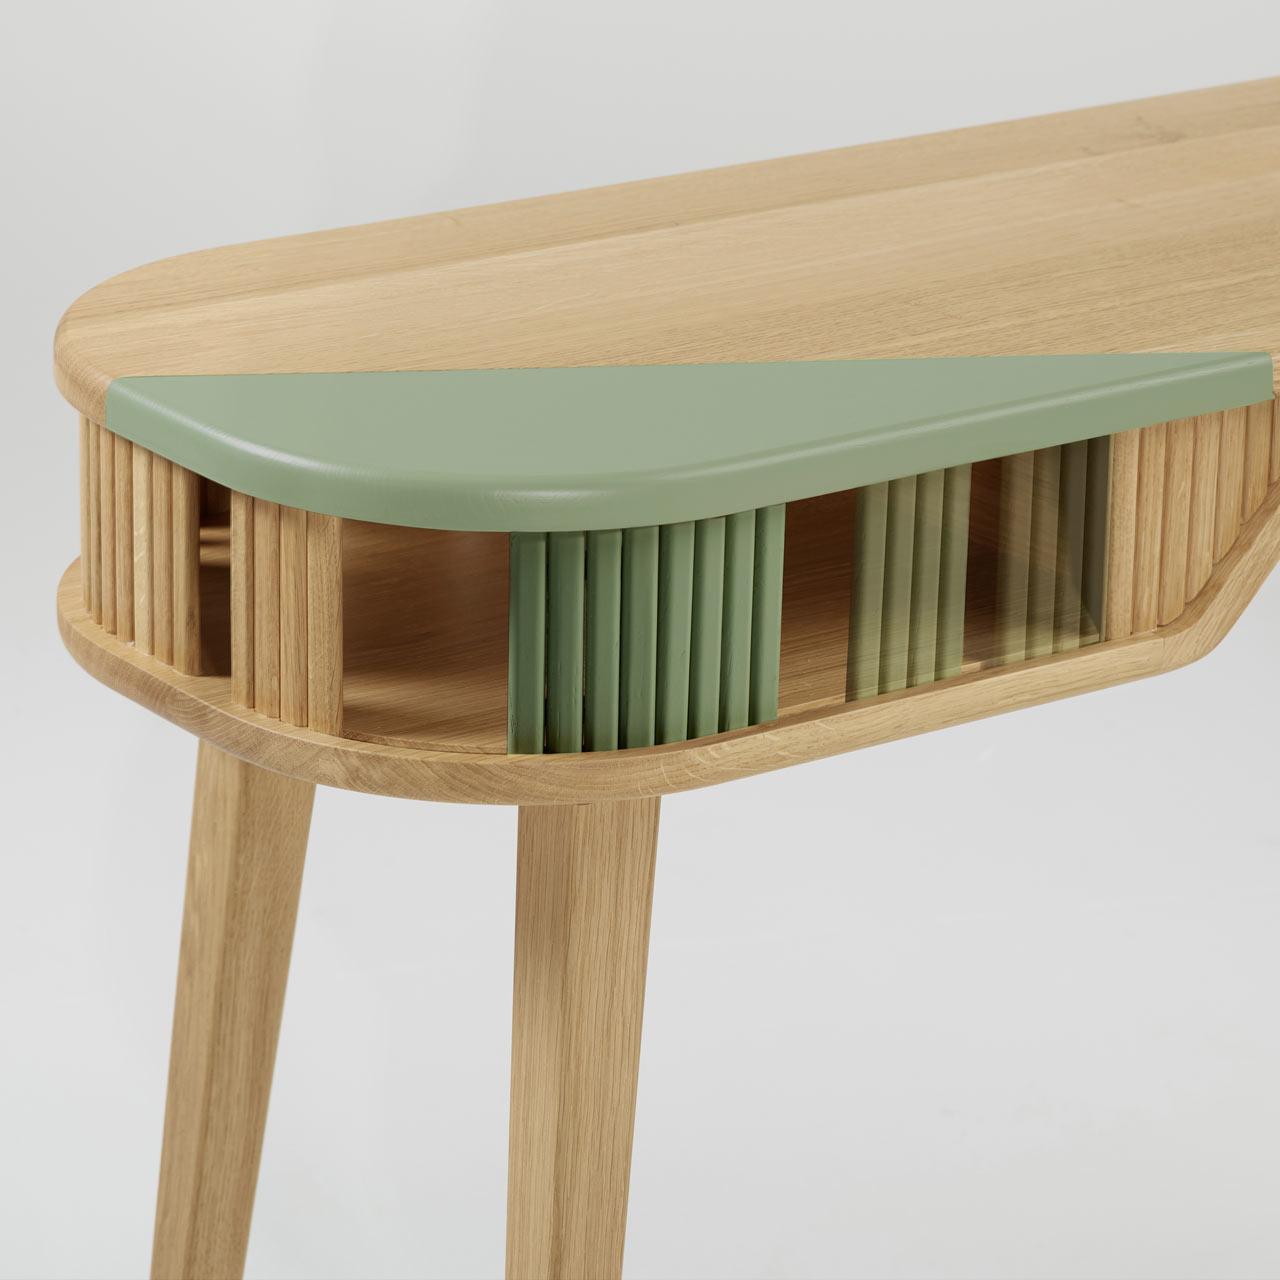 Julie-Gaillard-Latitude-Furniture-hisheji (7)